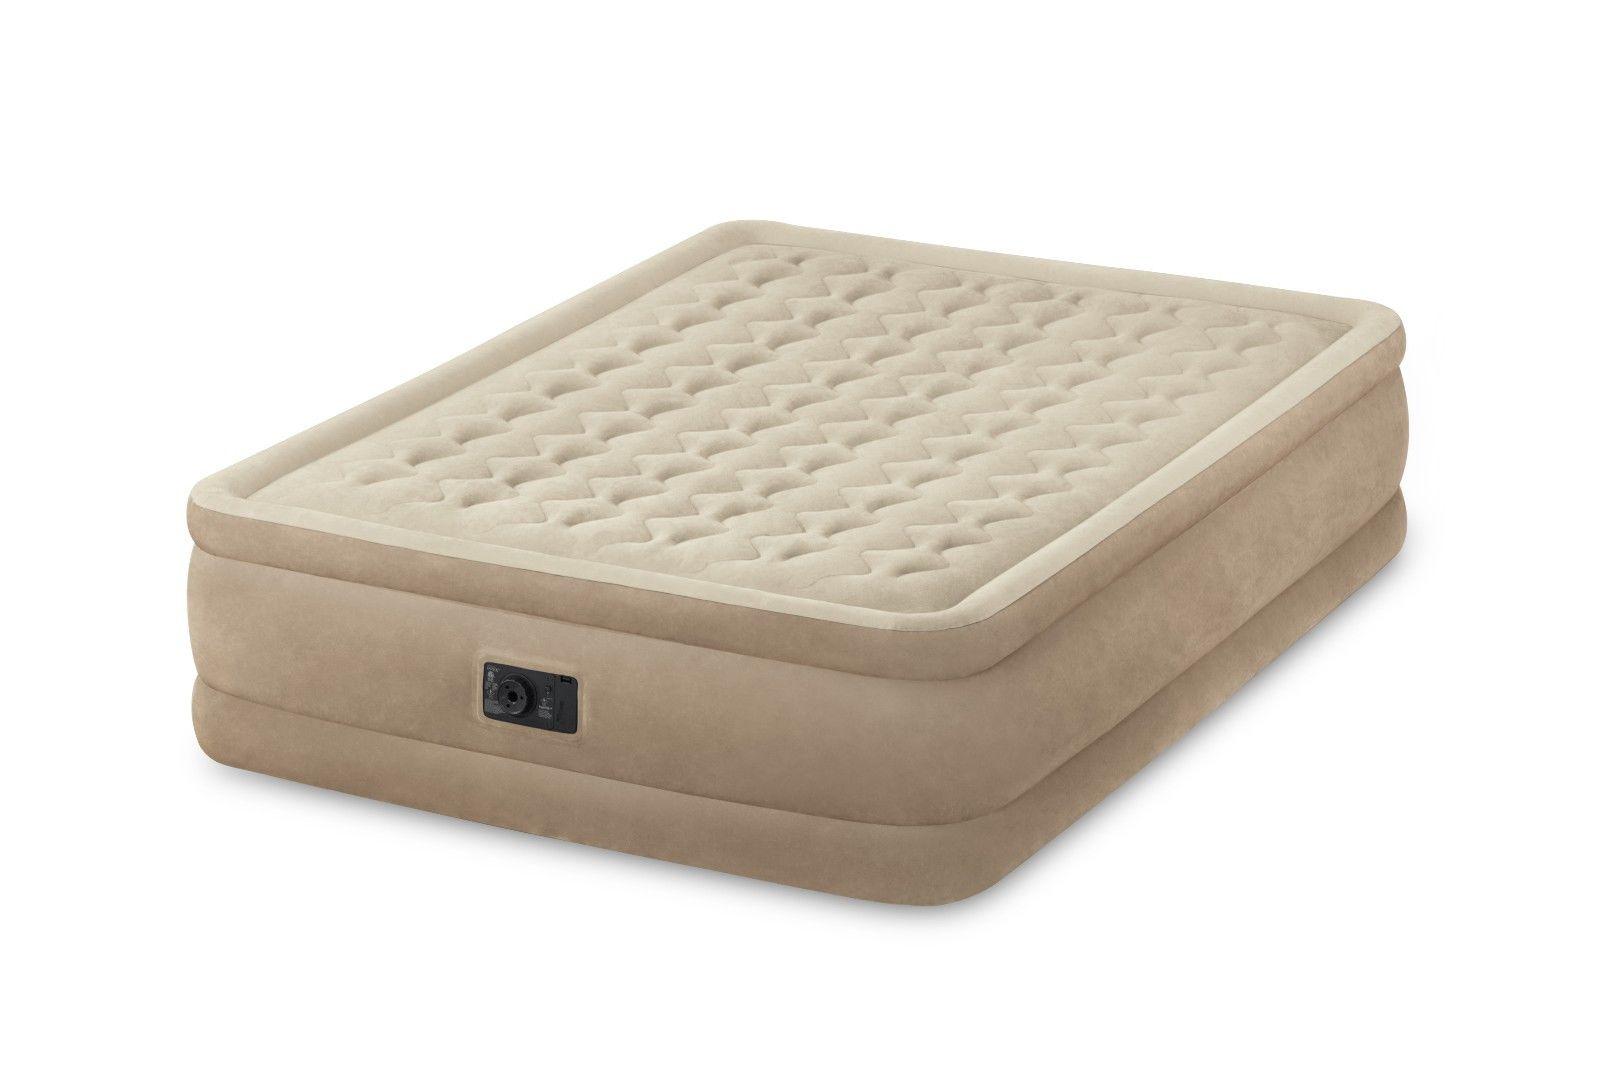 intex queen raised ultra push fiber-tech air bed mattress air bed